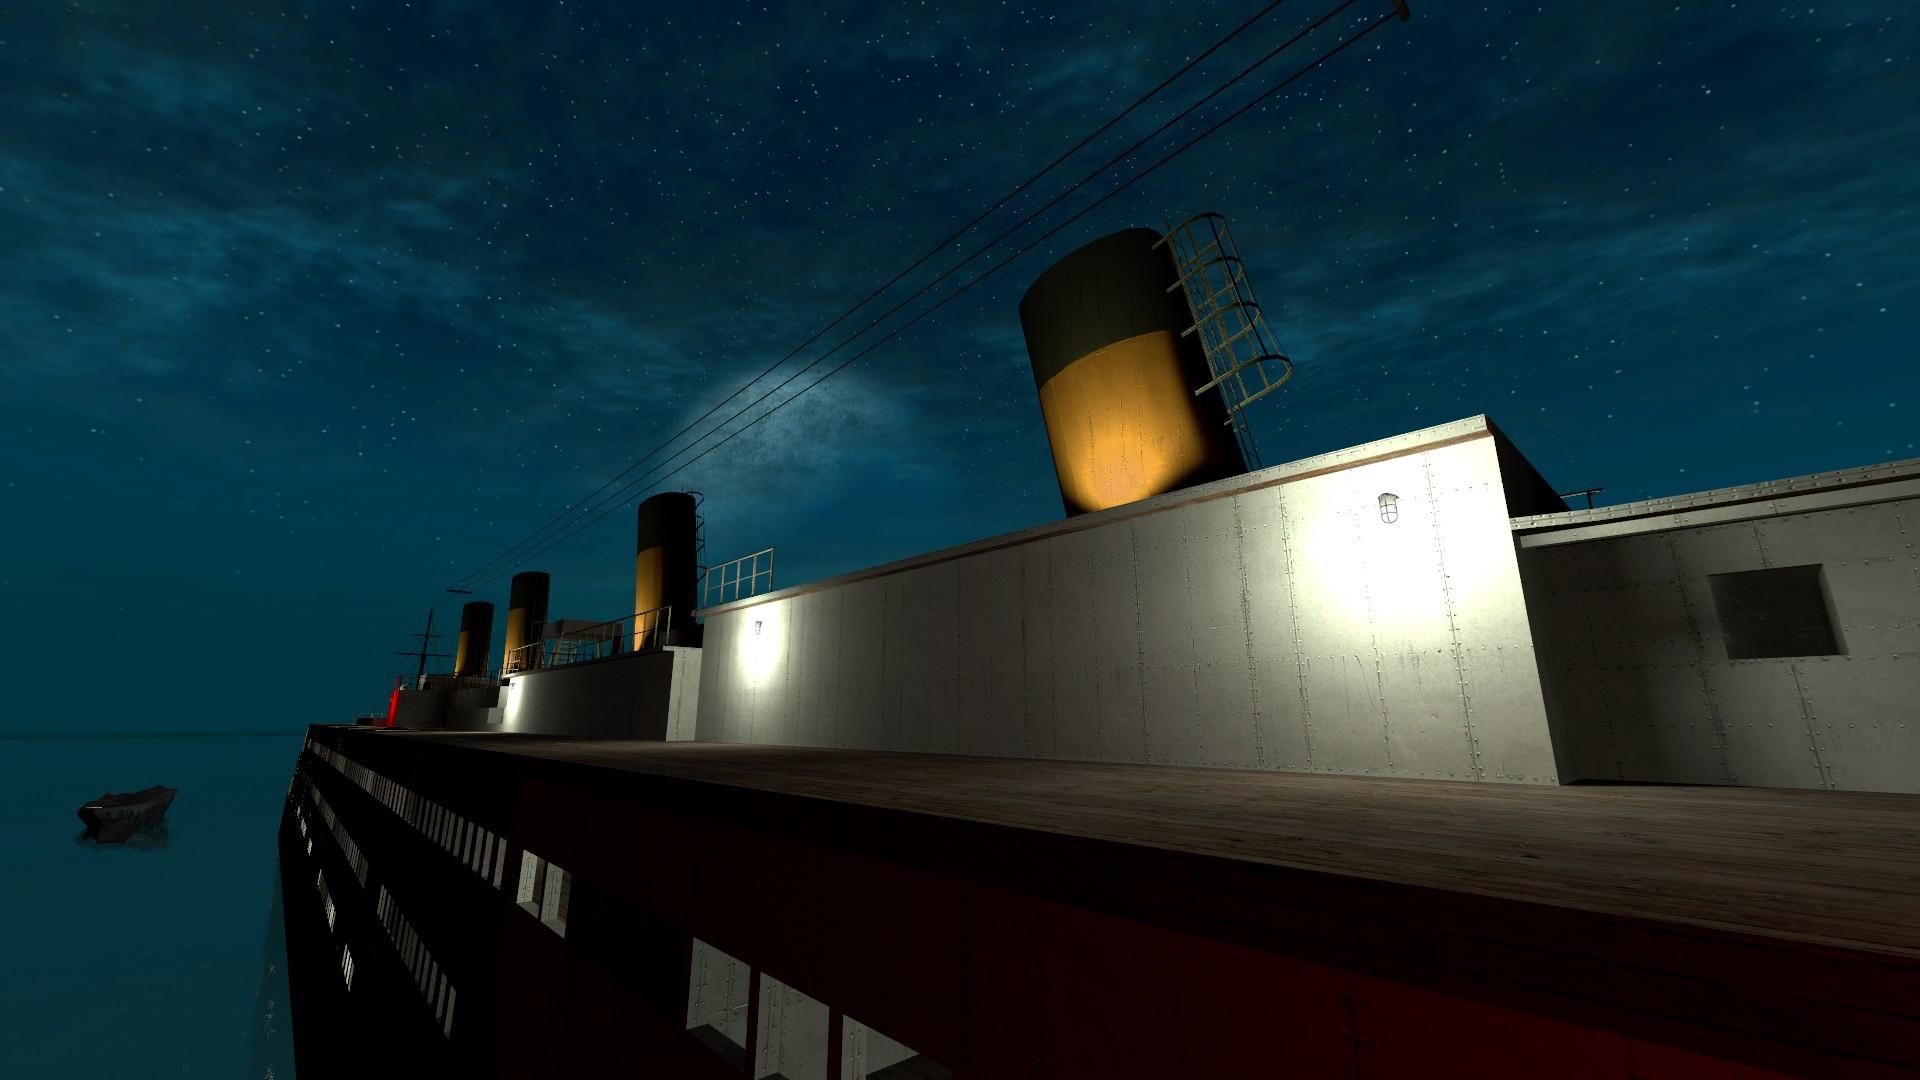 de_Titanic 4f3eabd989b4f